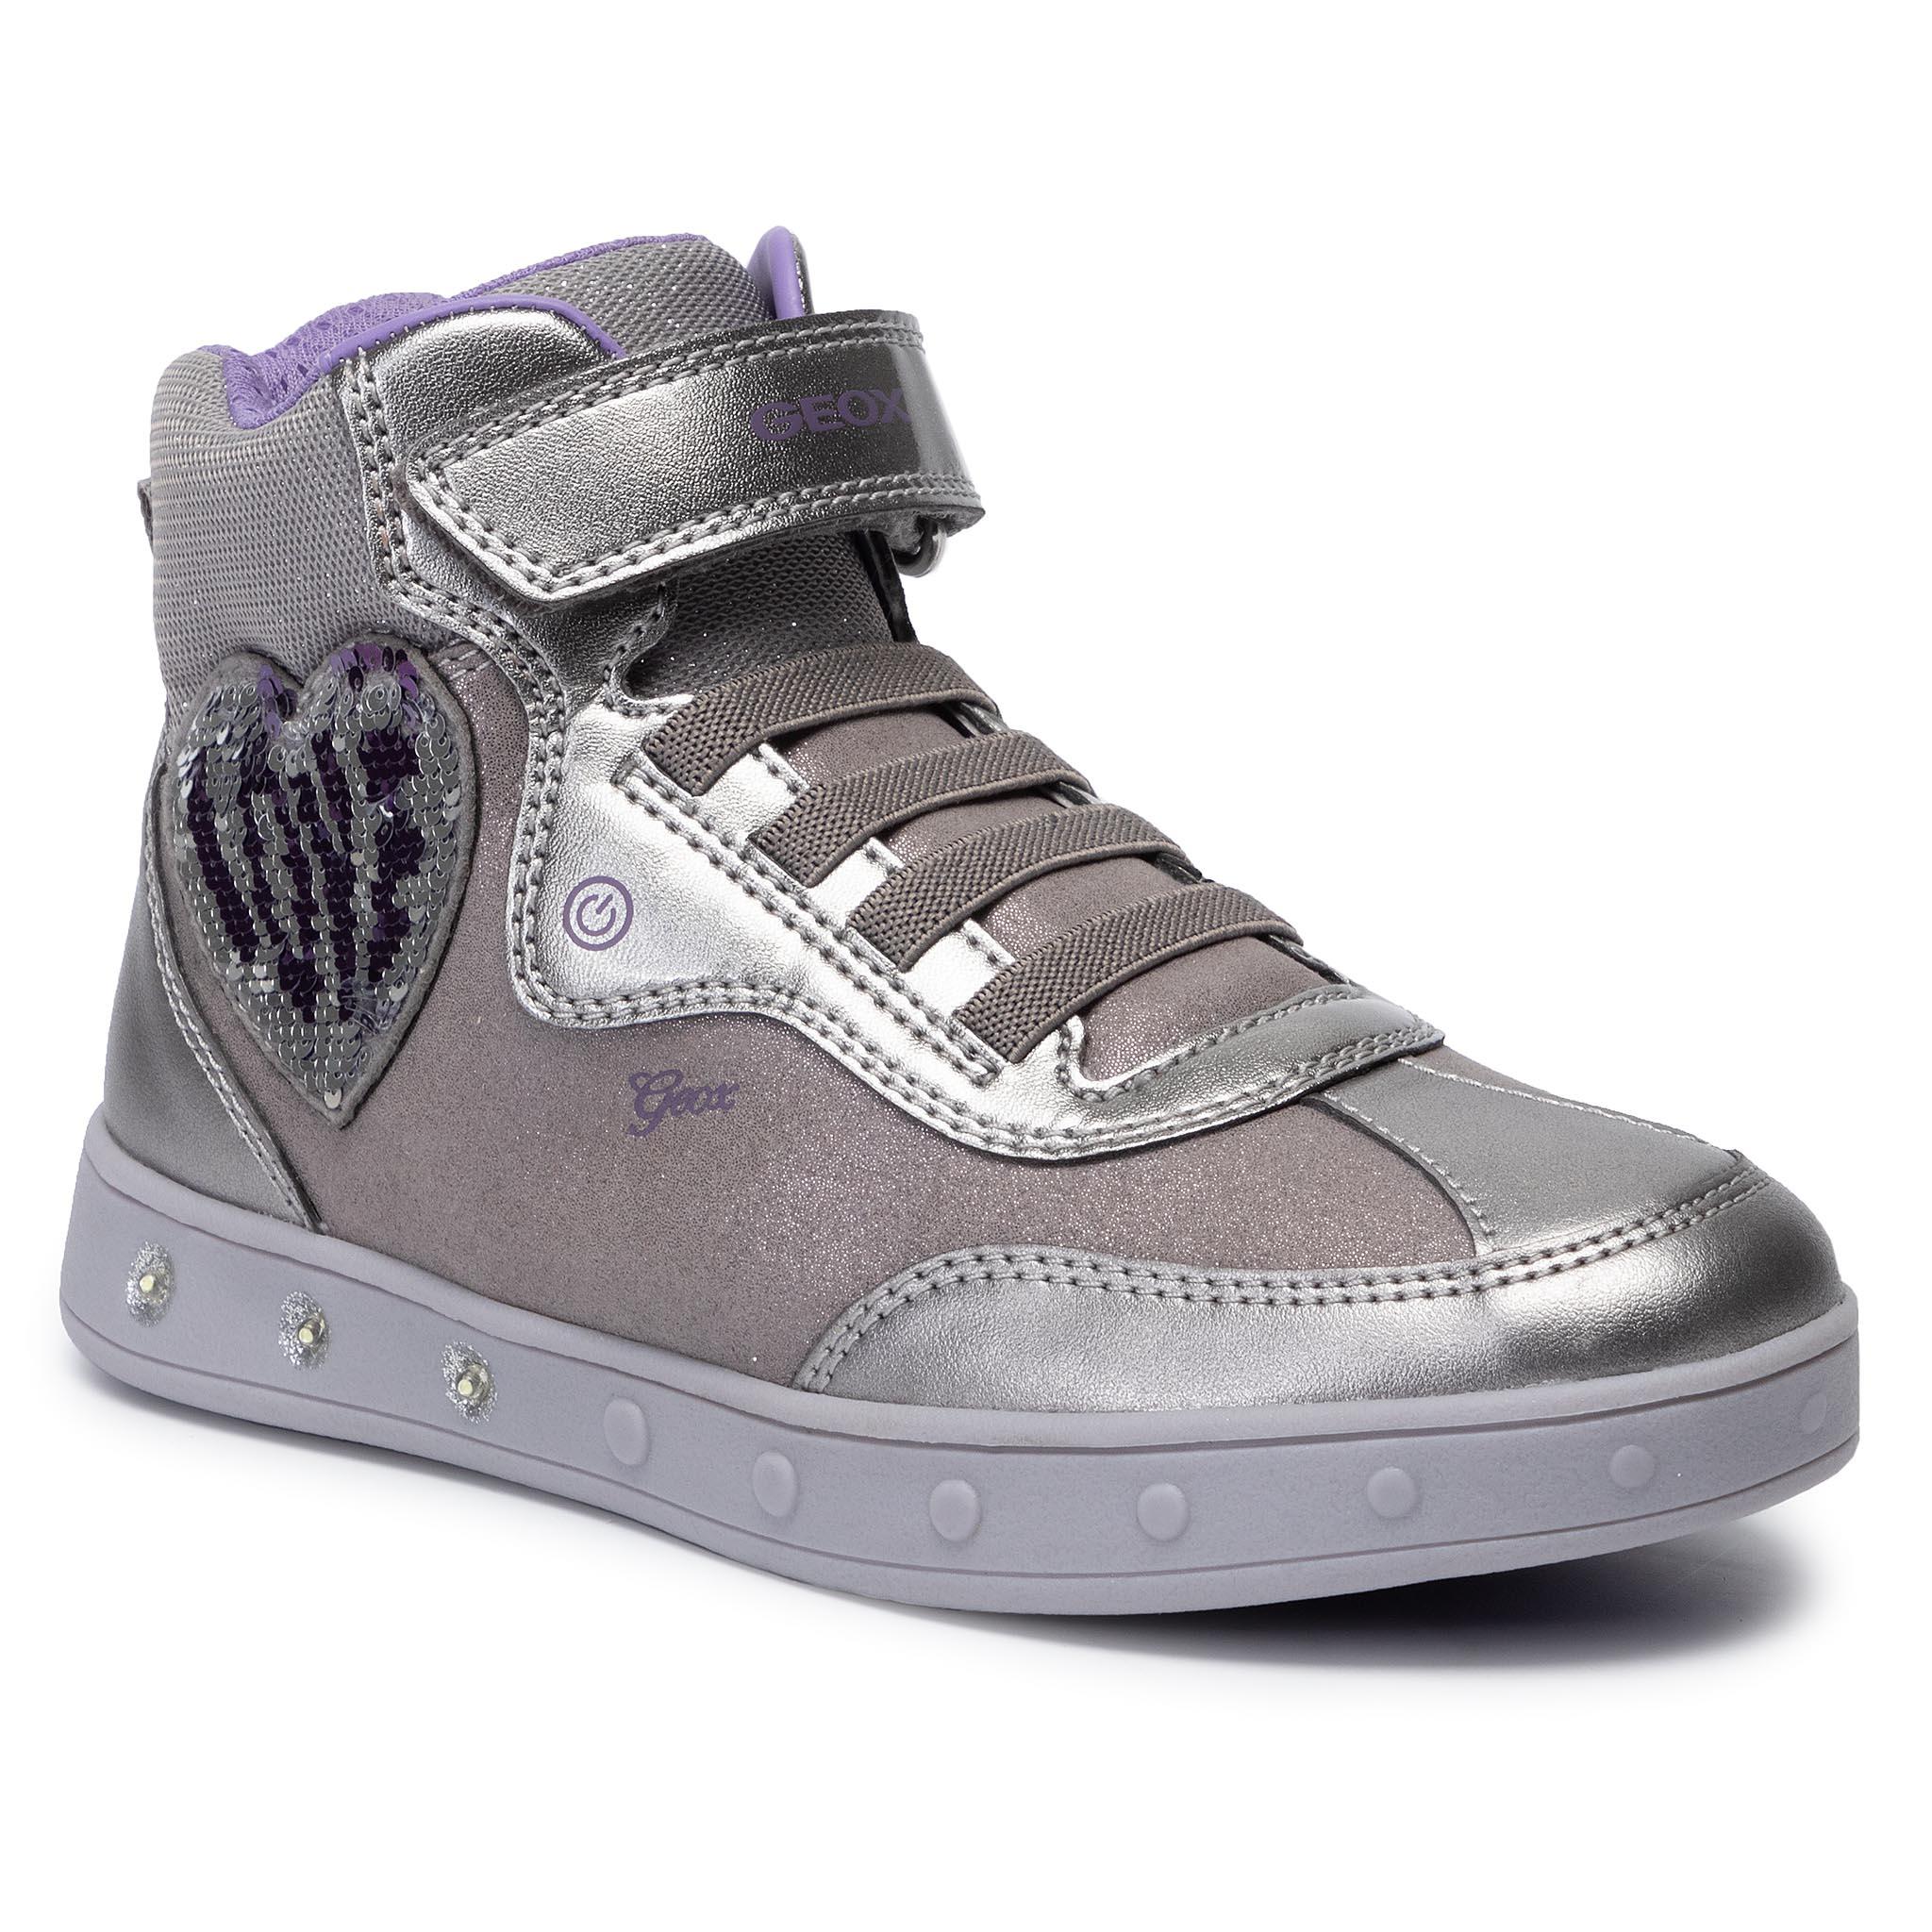 Shoes NIKE Air Max Axis (GS) AH5222 003 Wolf GreyTotal